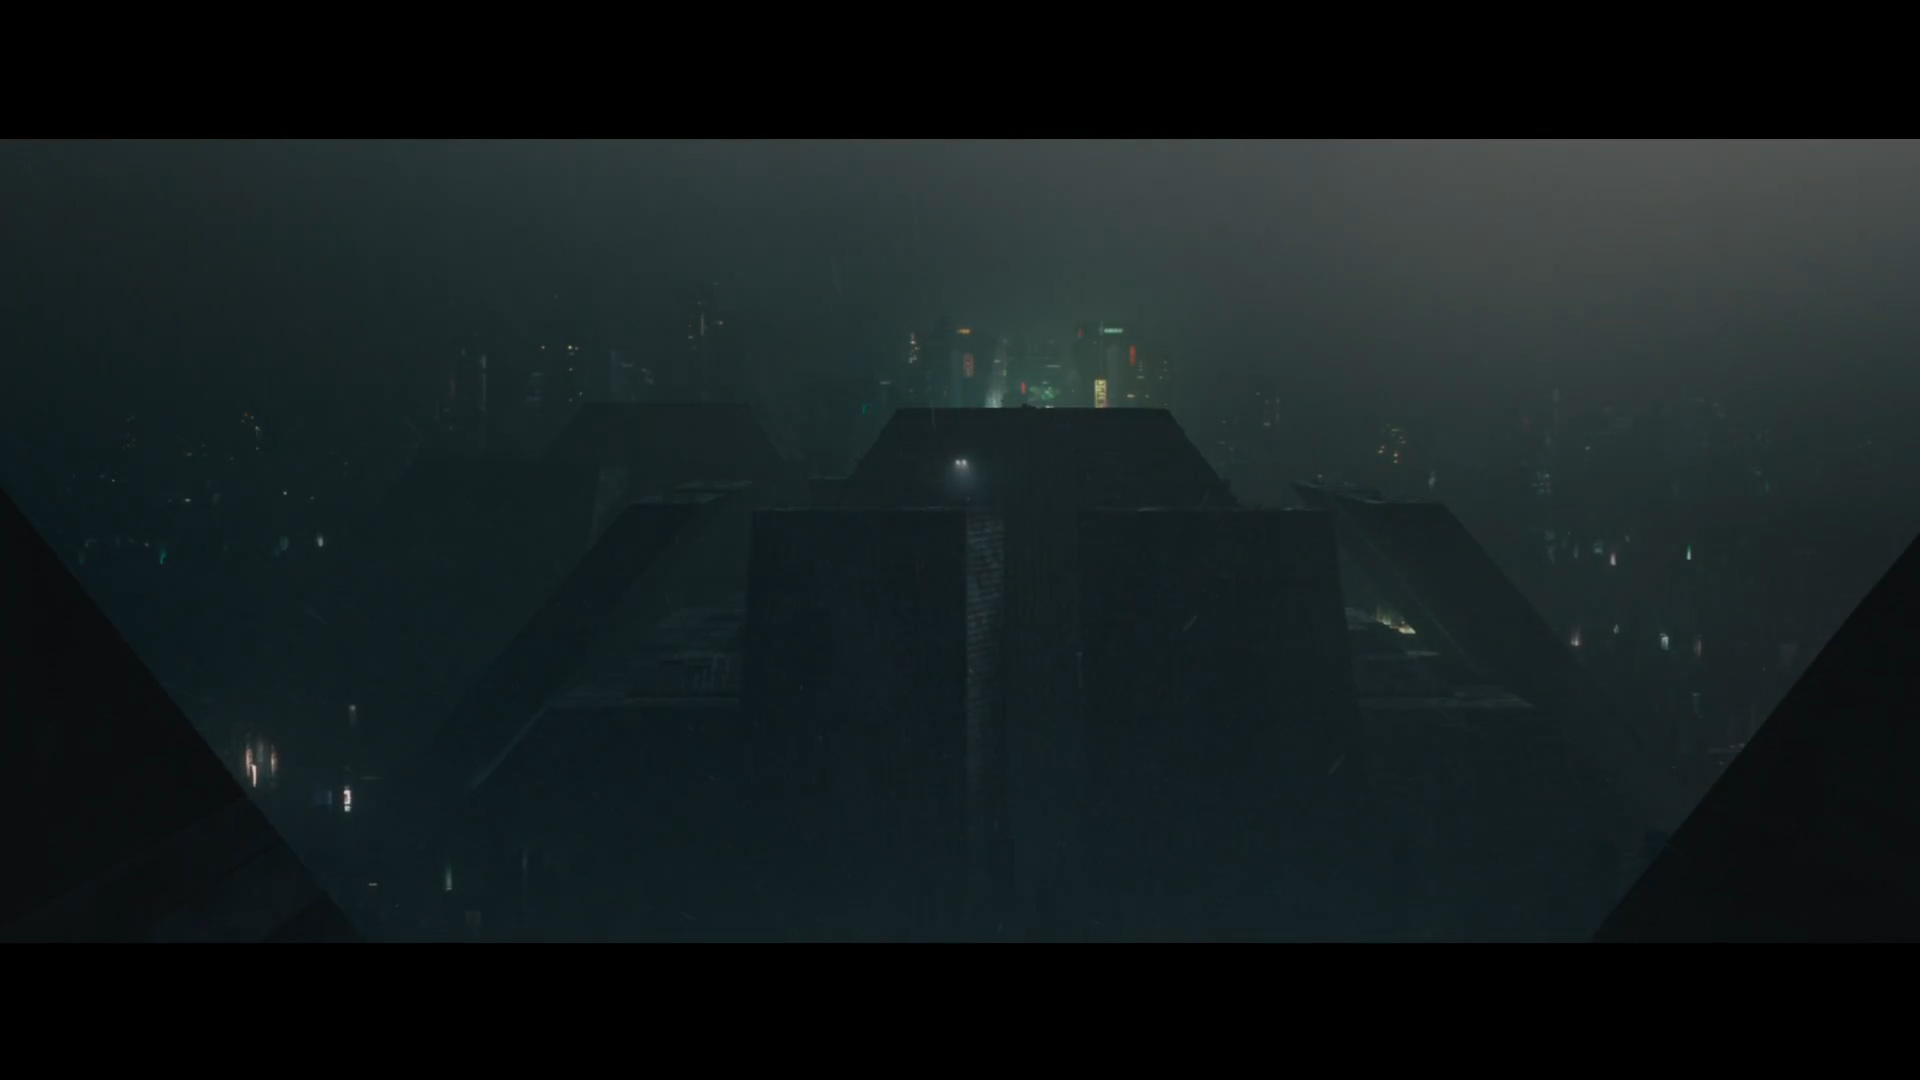 Blade Runner 2049 Trailer Wallpapers 3 Resized By Ze Robot